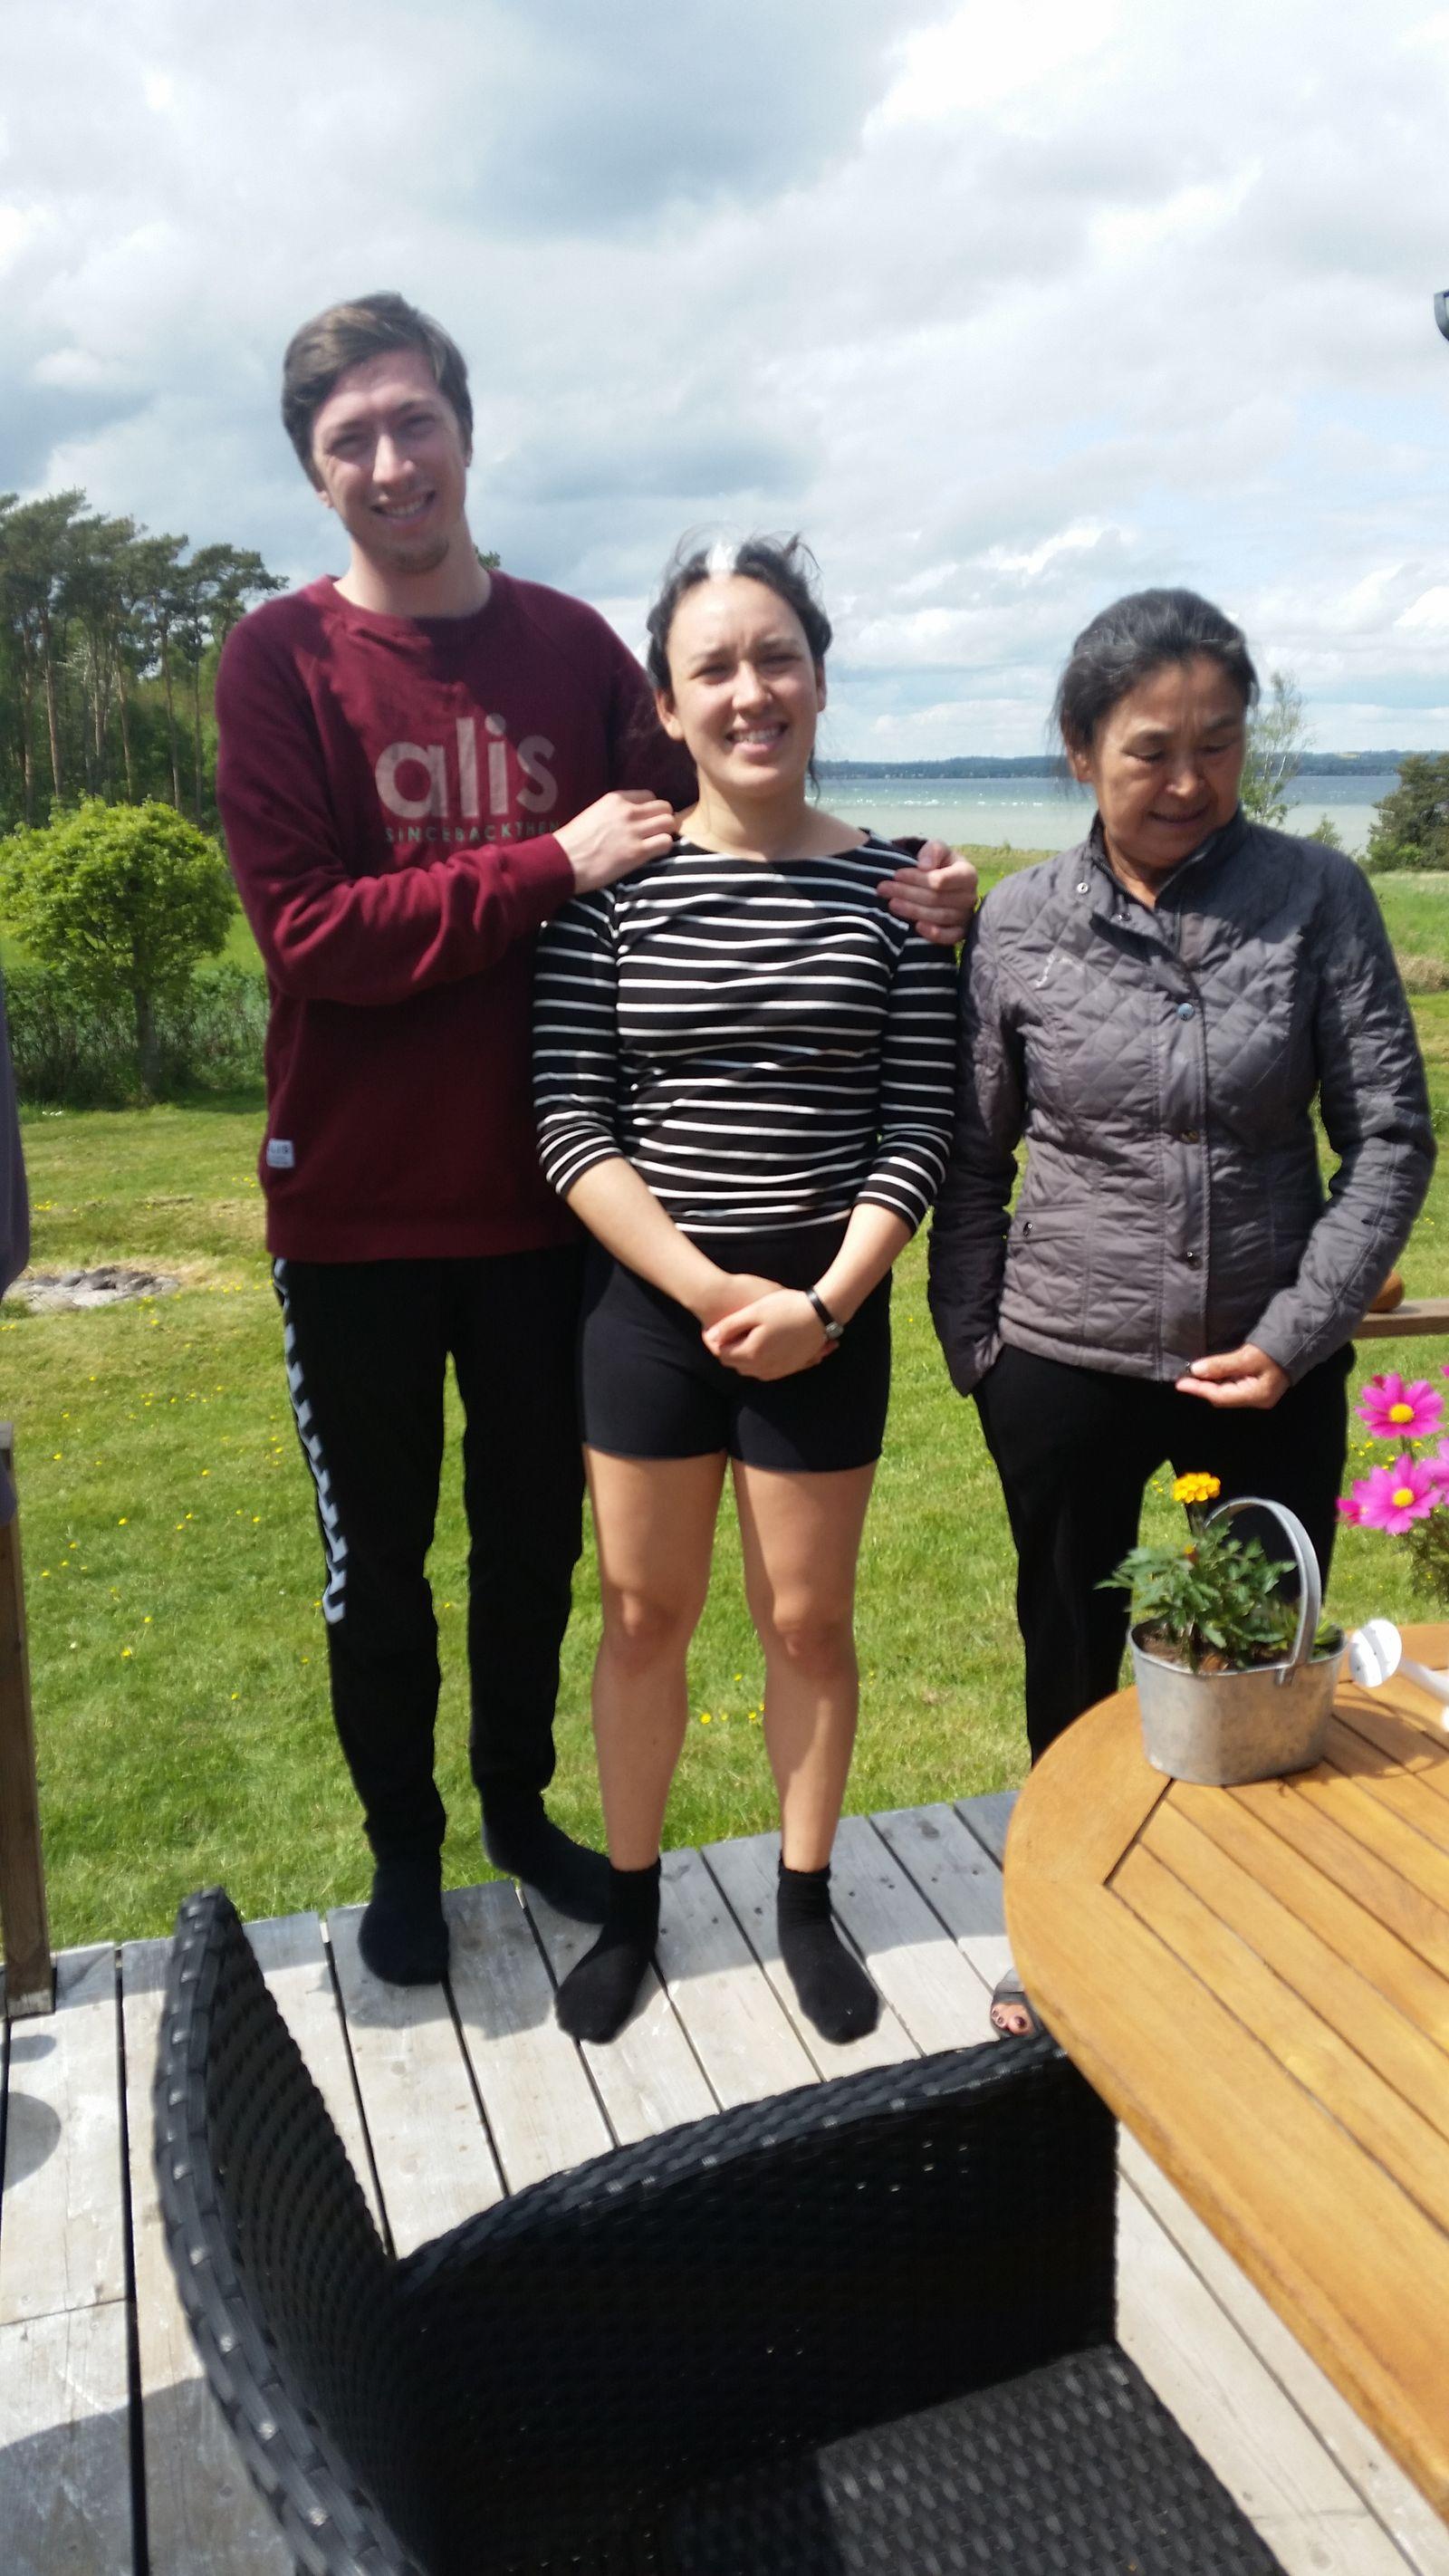 2016-05-14-1338_-_ivalo_lynge_labansen__martha_labansen__salik_lings_skifte